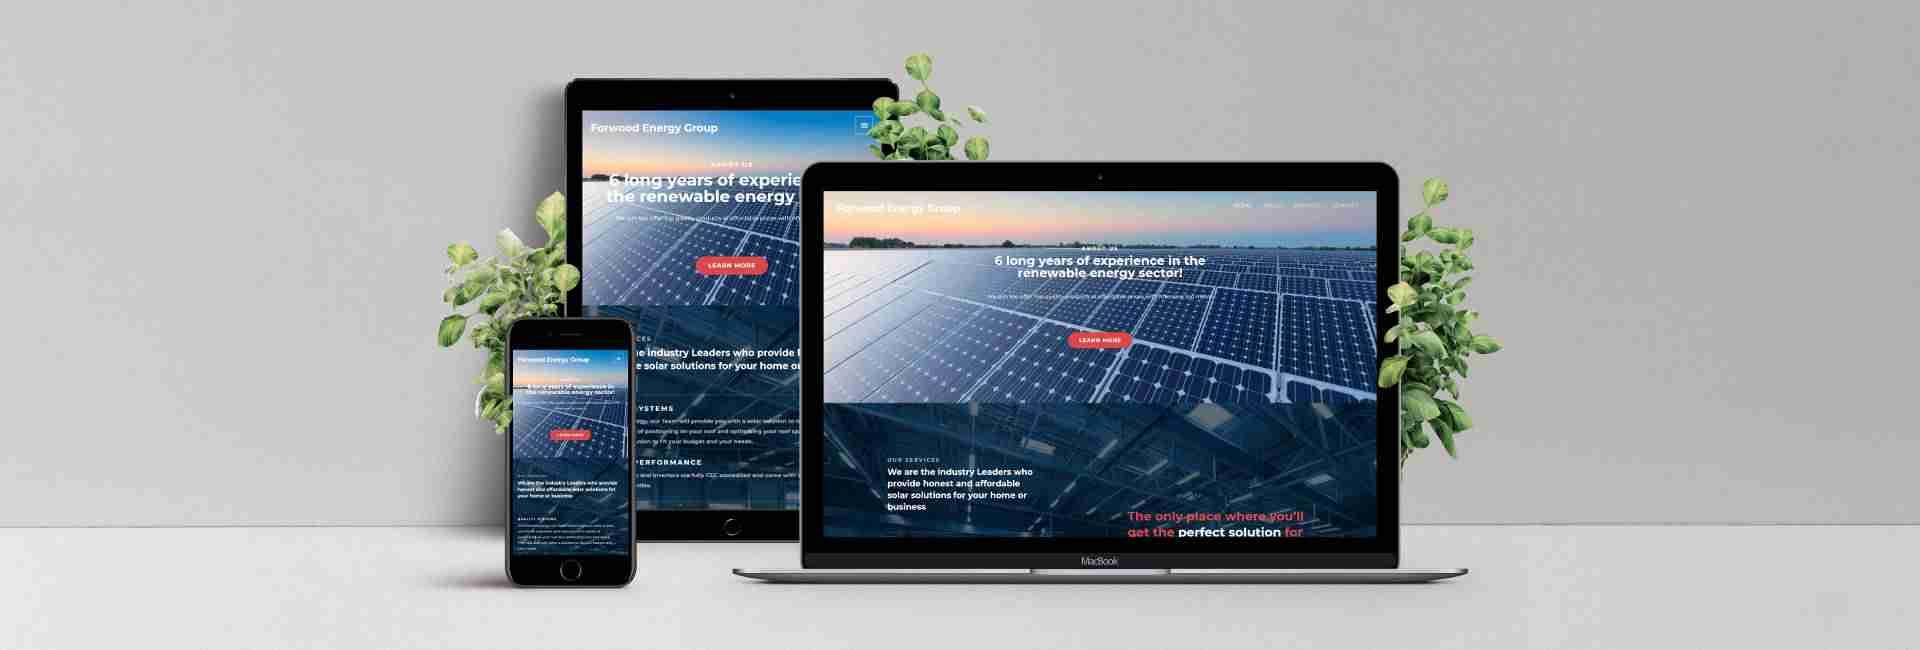 Forwoood Energy Group Web Design Portfolio